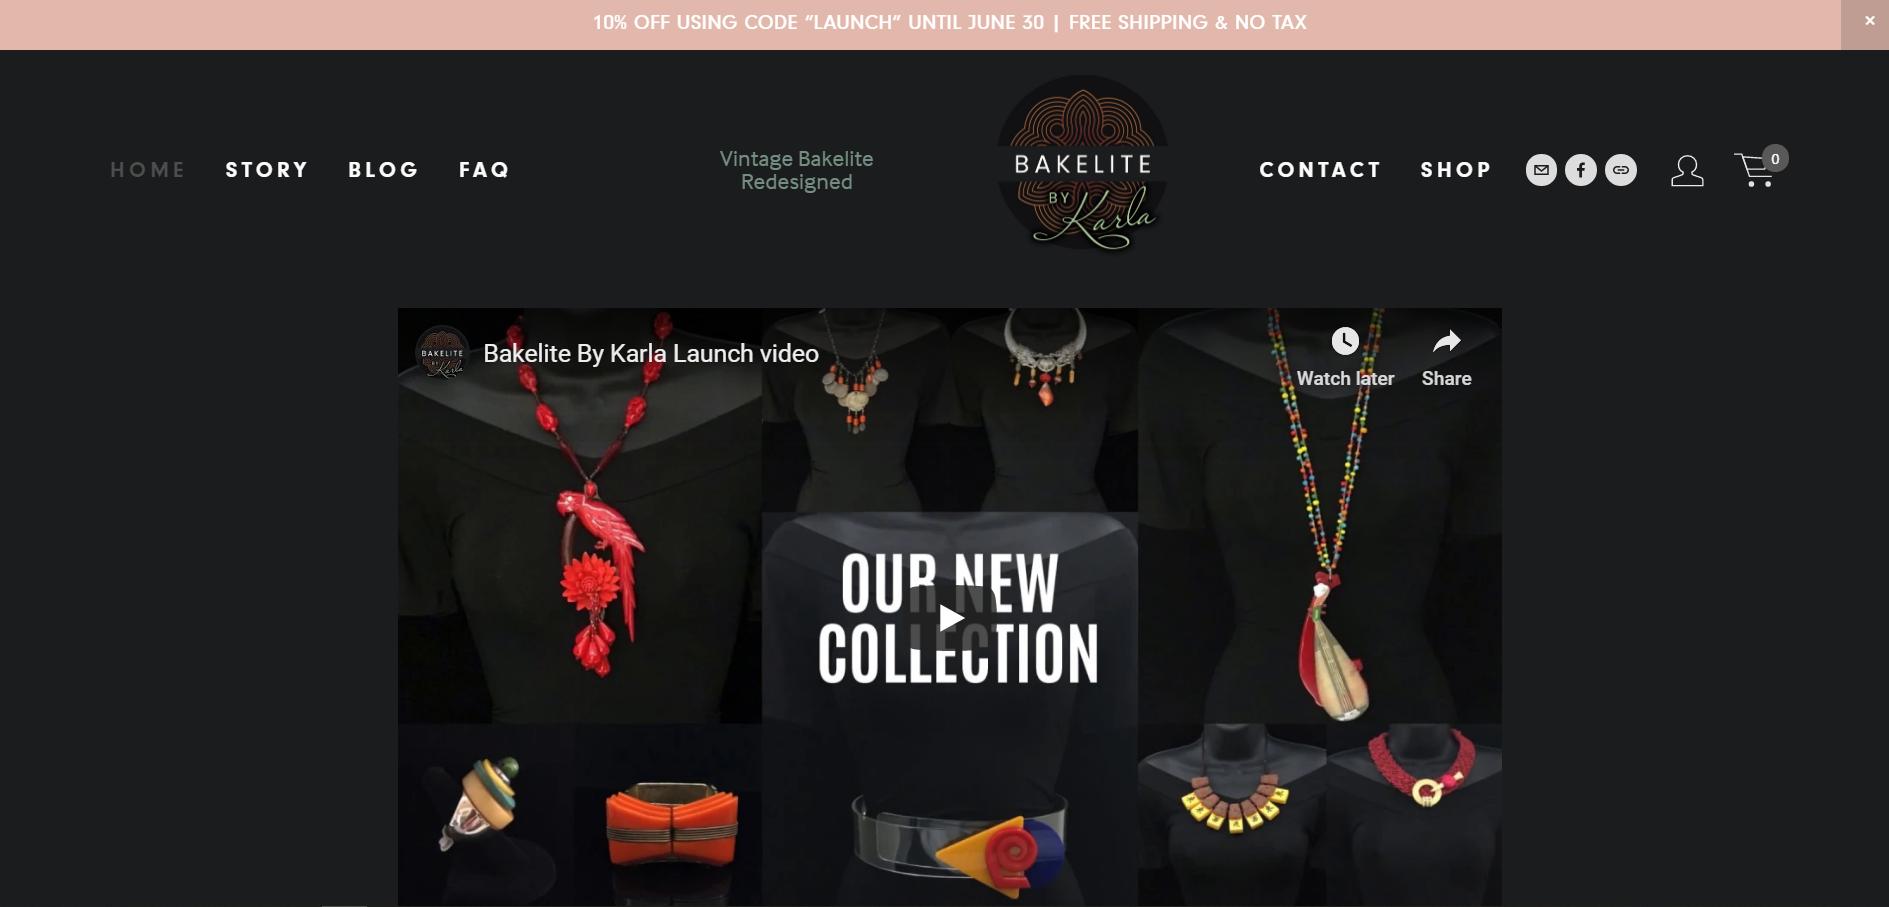 Bakelite By Karla - Ecommerce Jewelry Shop